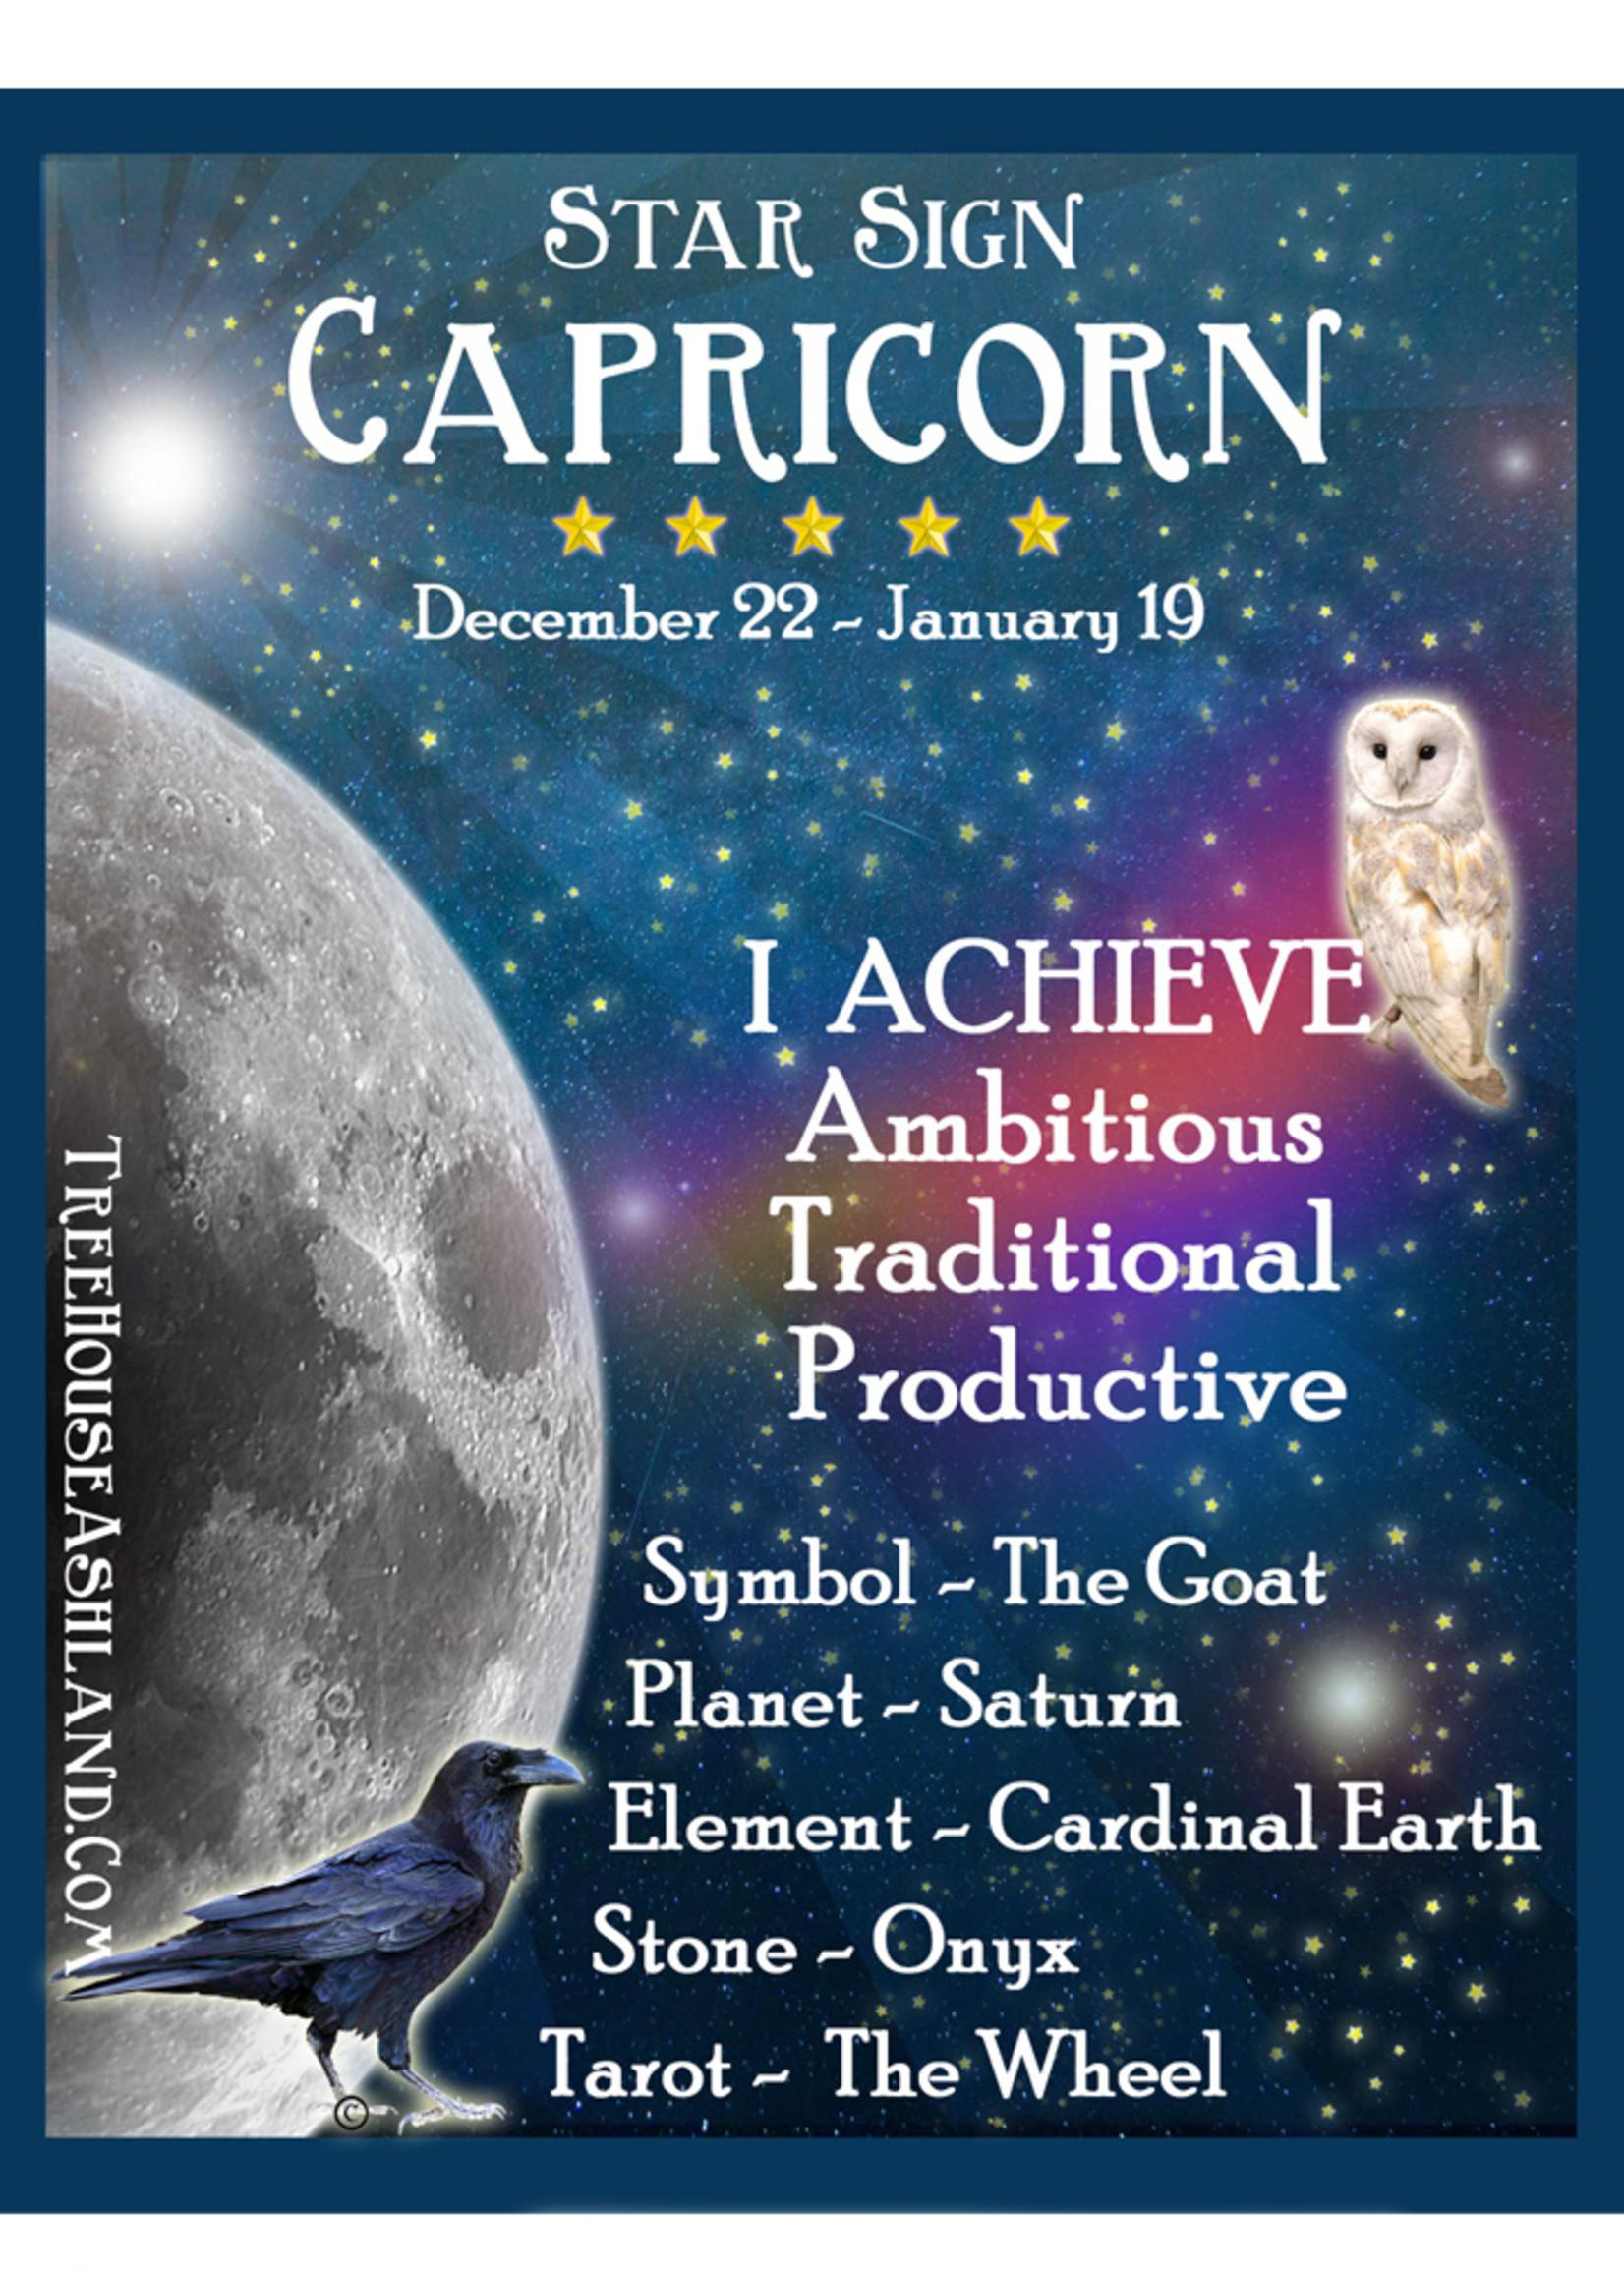 Star Sign Zodiac Kit, Capricorn